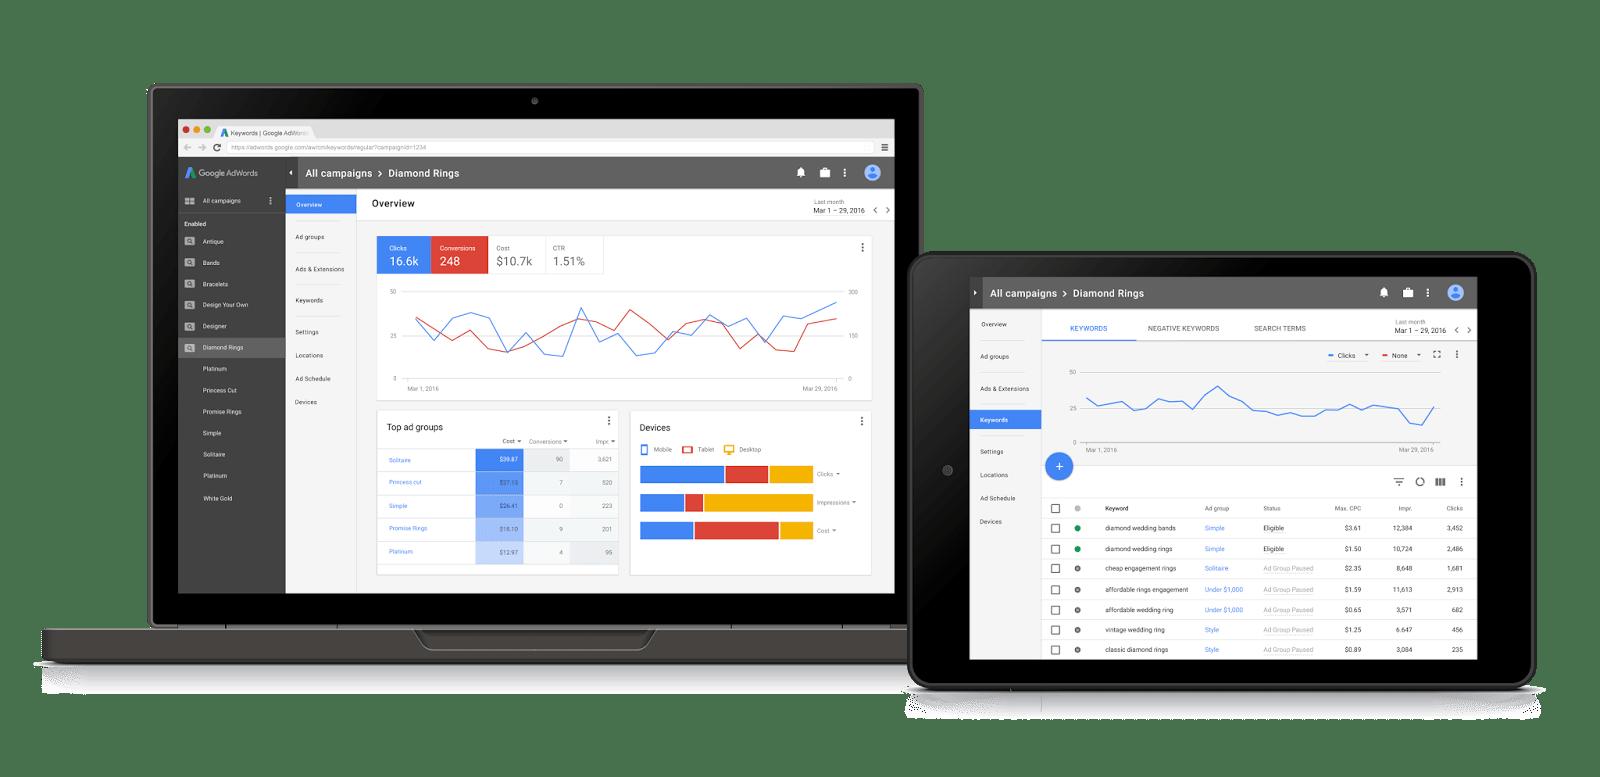 AdWords interface